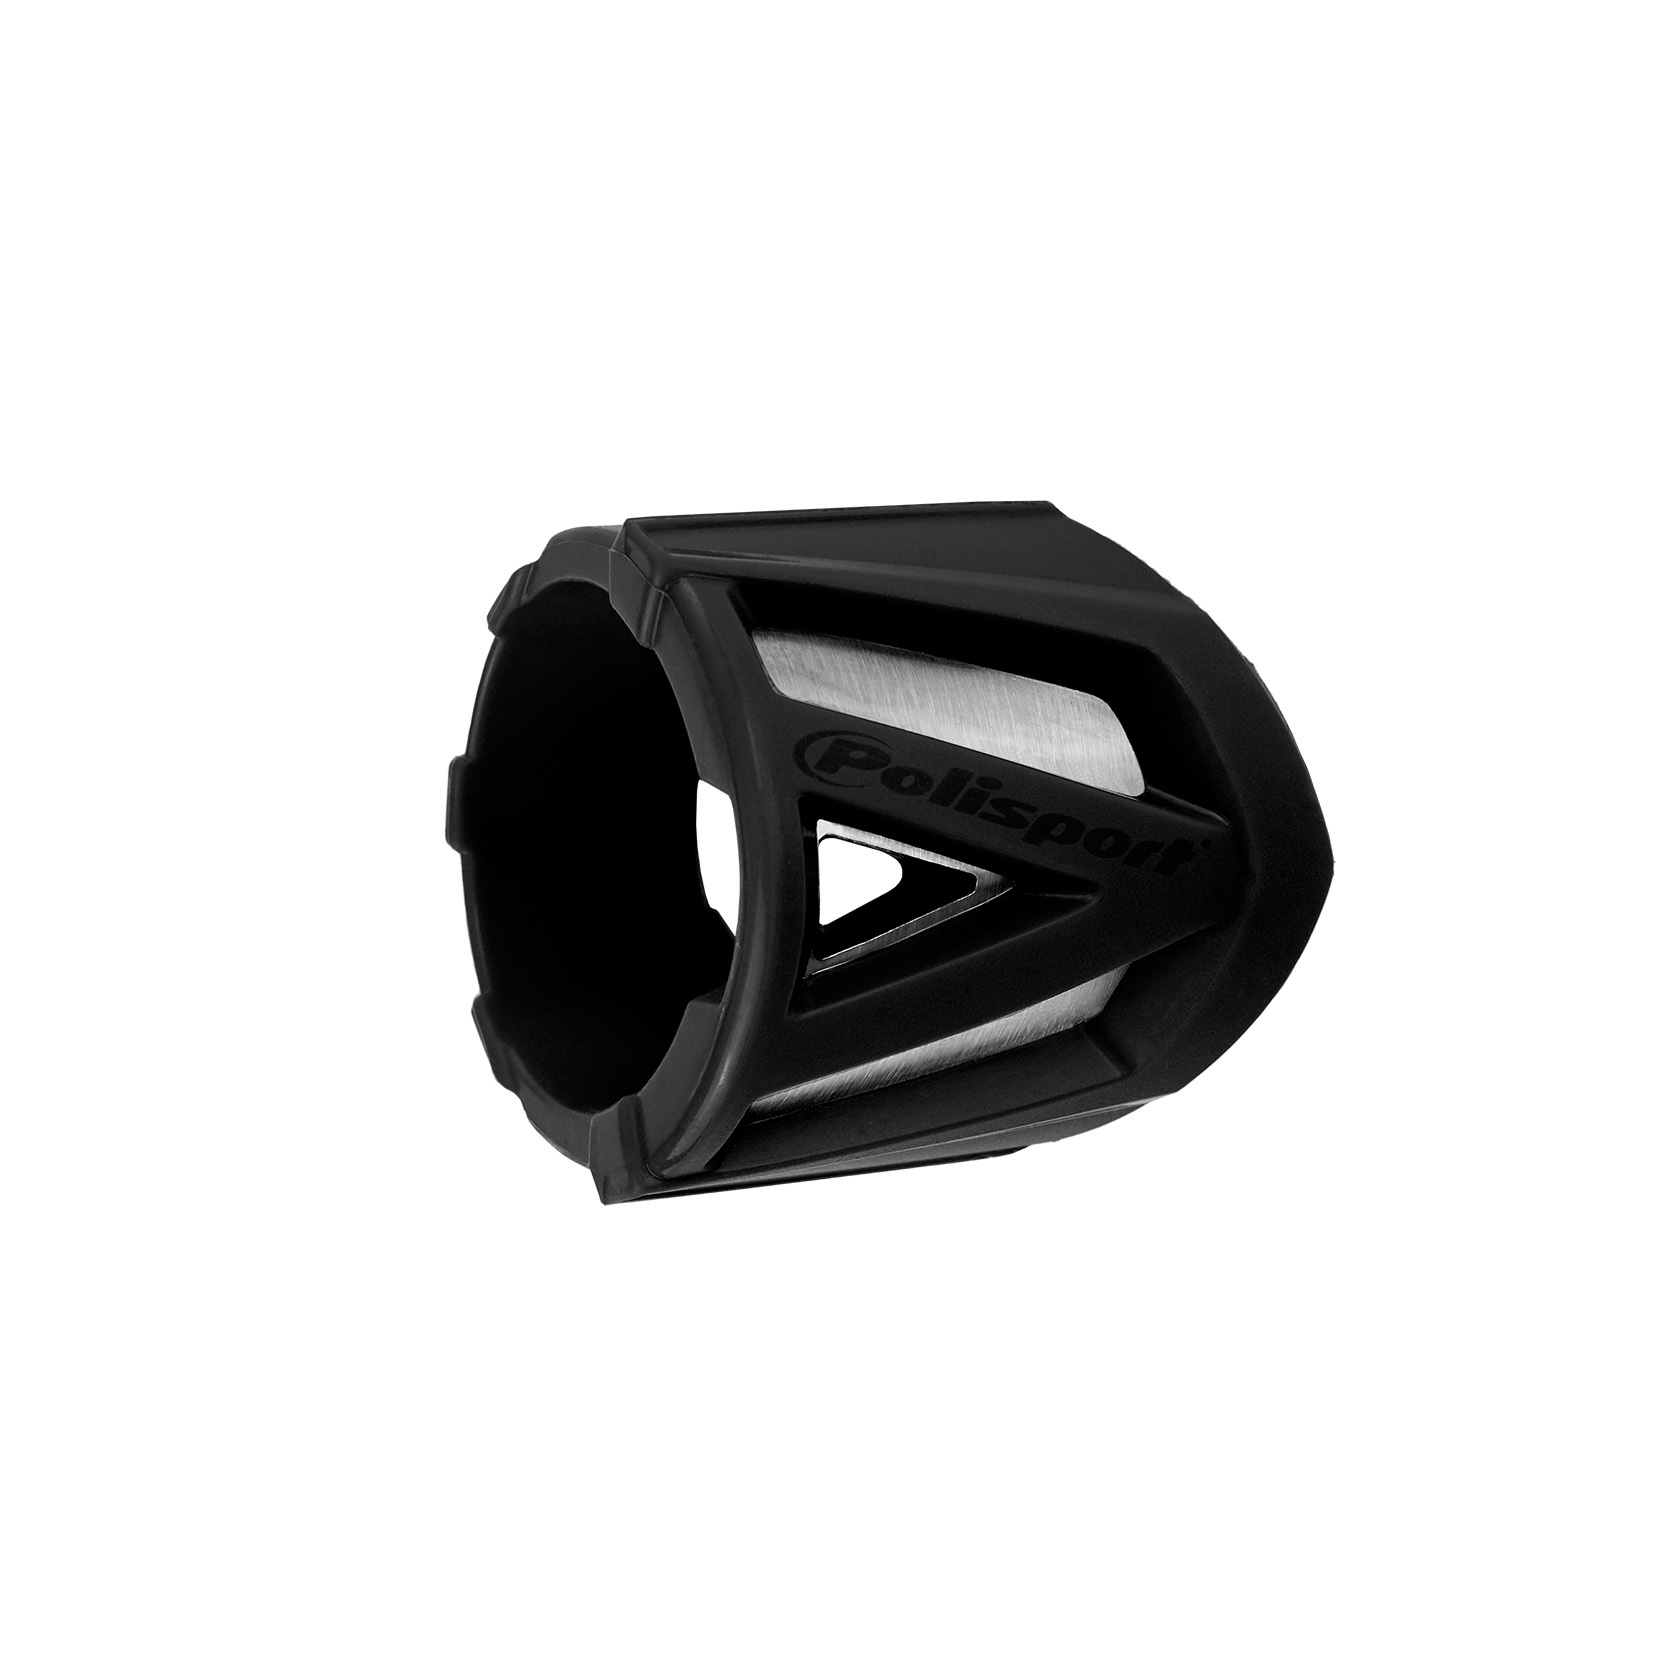 silencer-protector-3.jpg#asset:33080